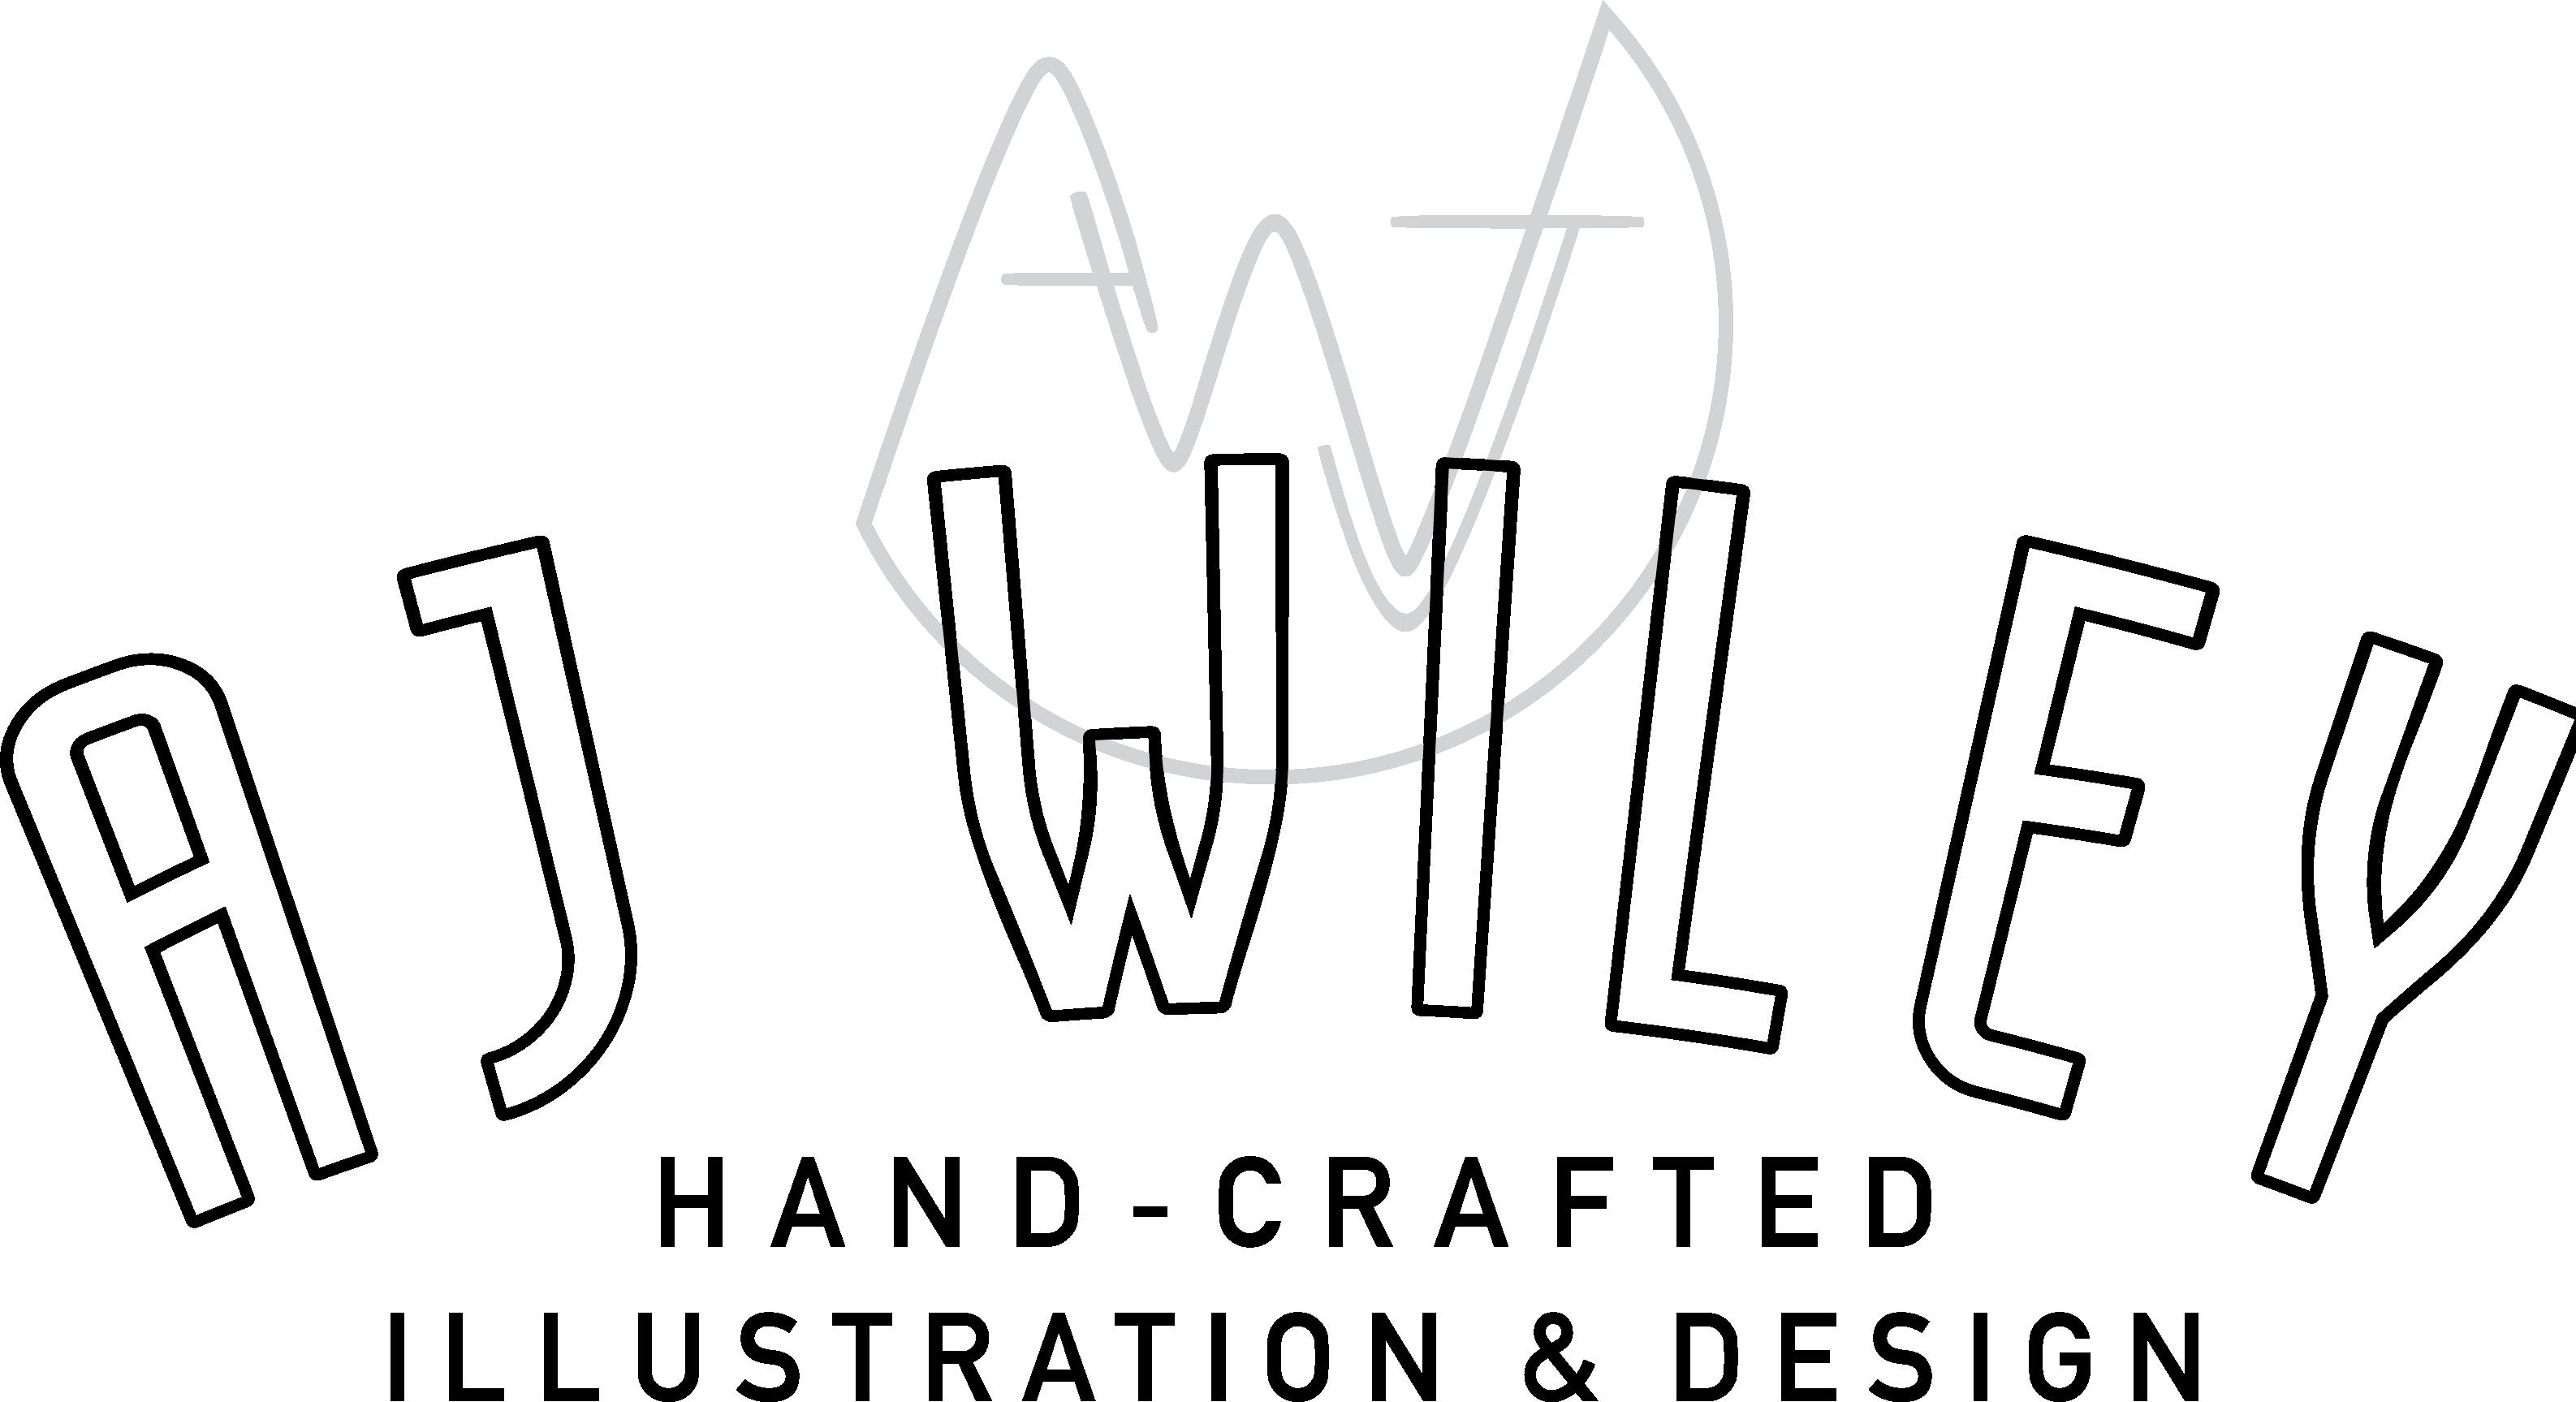 AJ Wiley